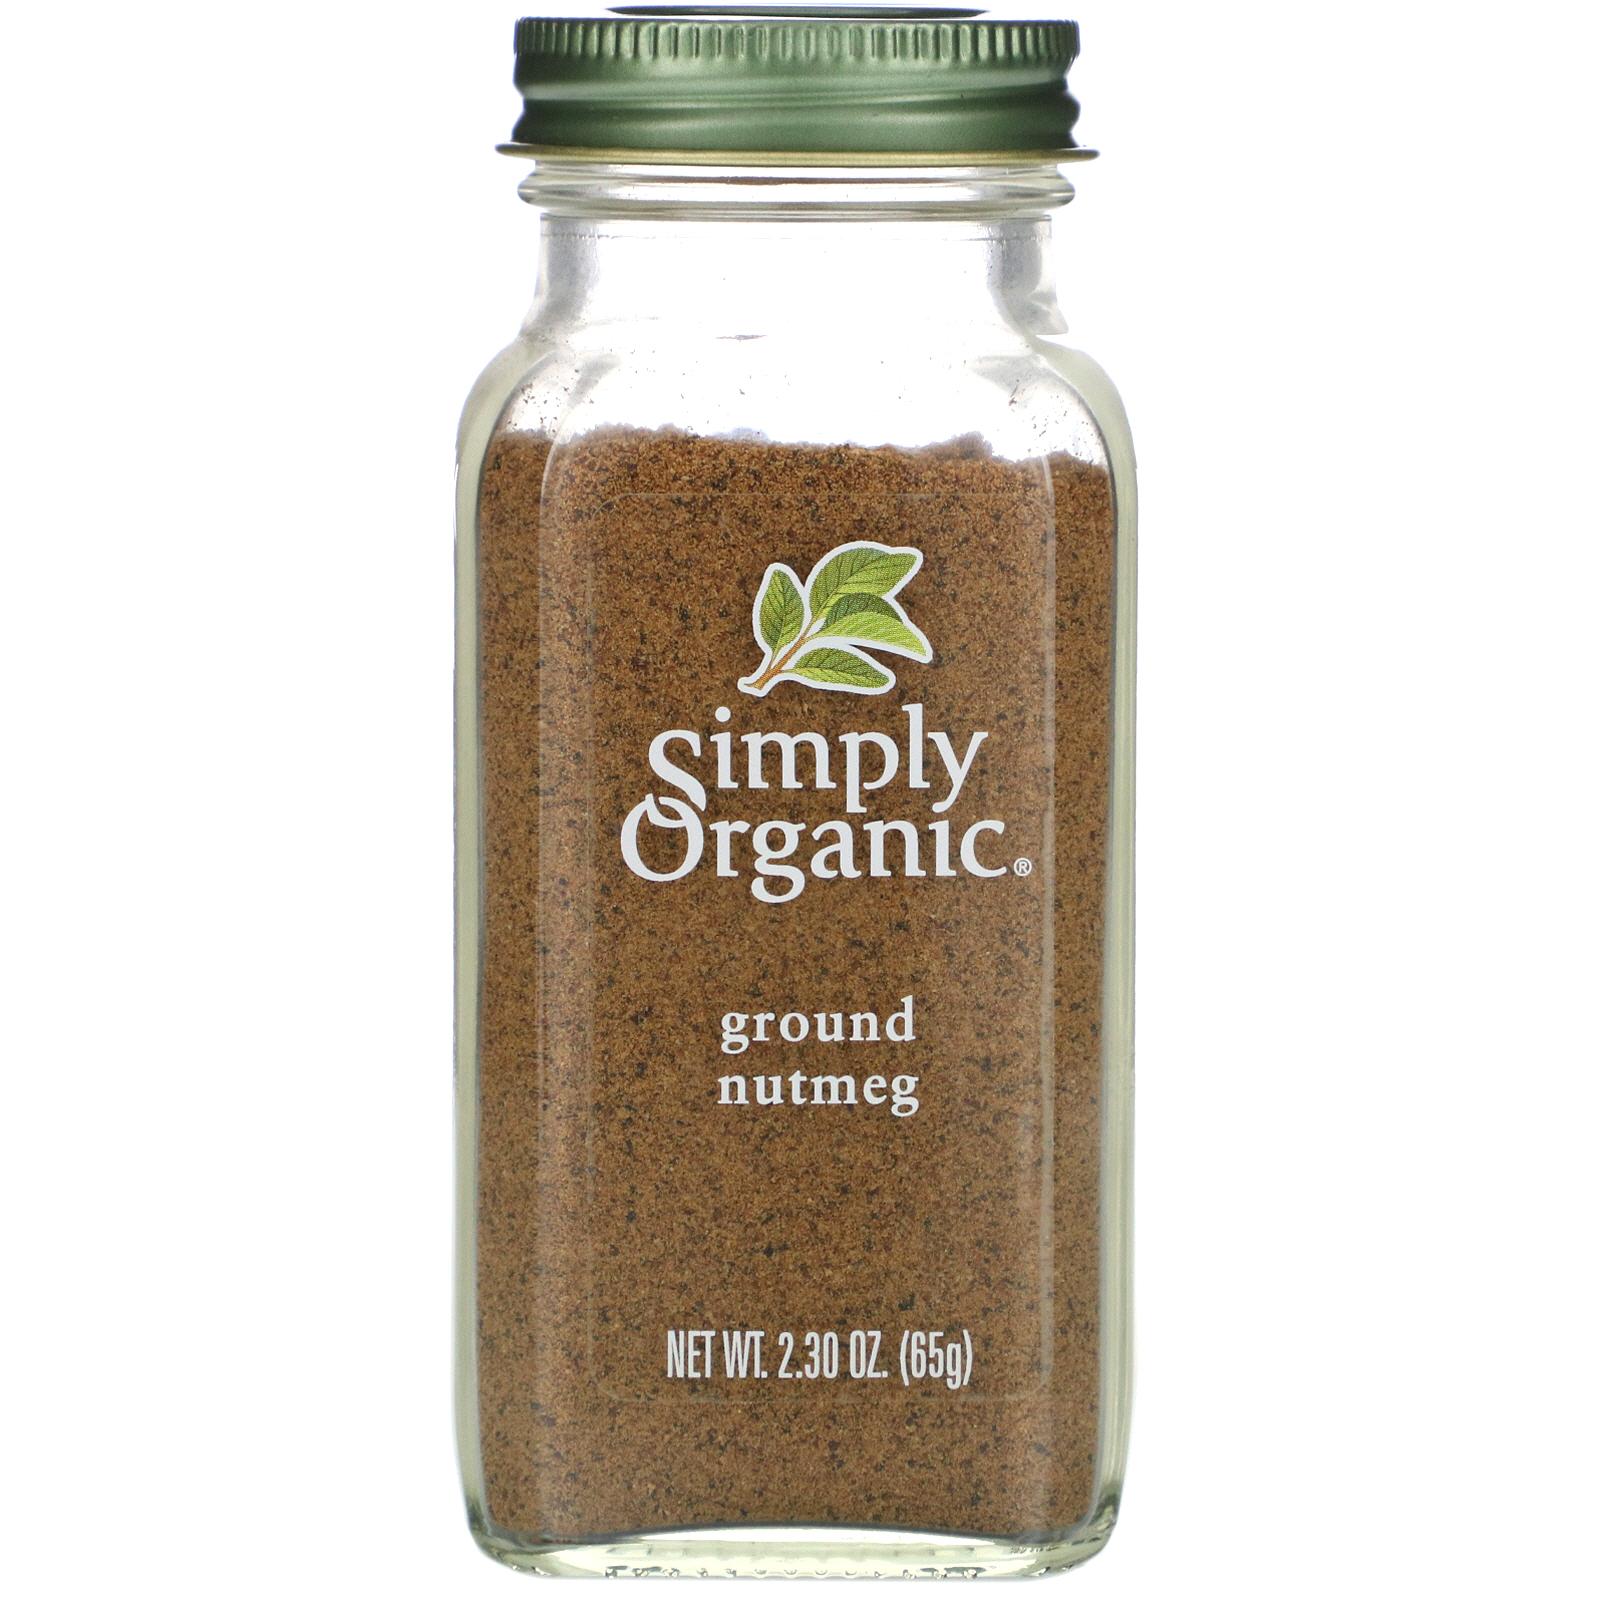 Simply Organic جوزة الطيب مطحونة 2 30 أونصة 65 جم Iherb